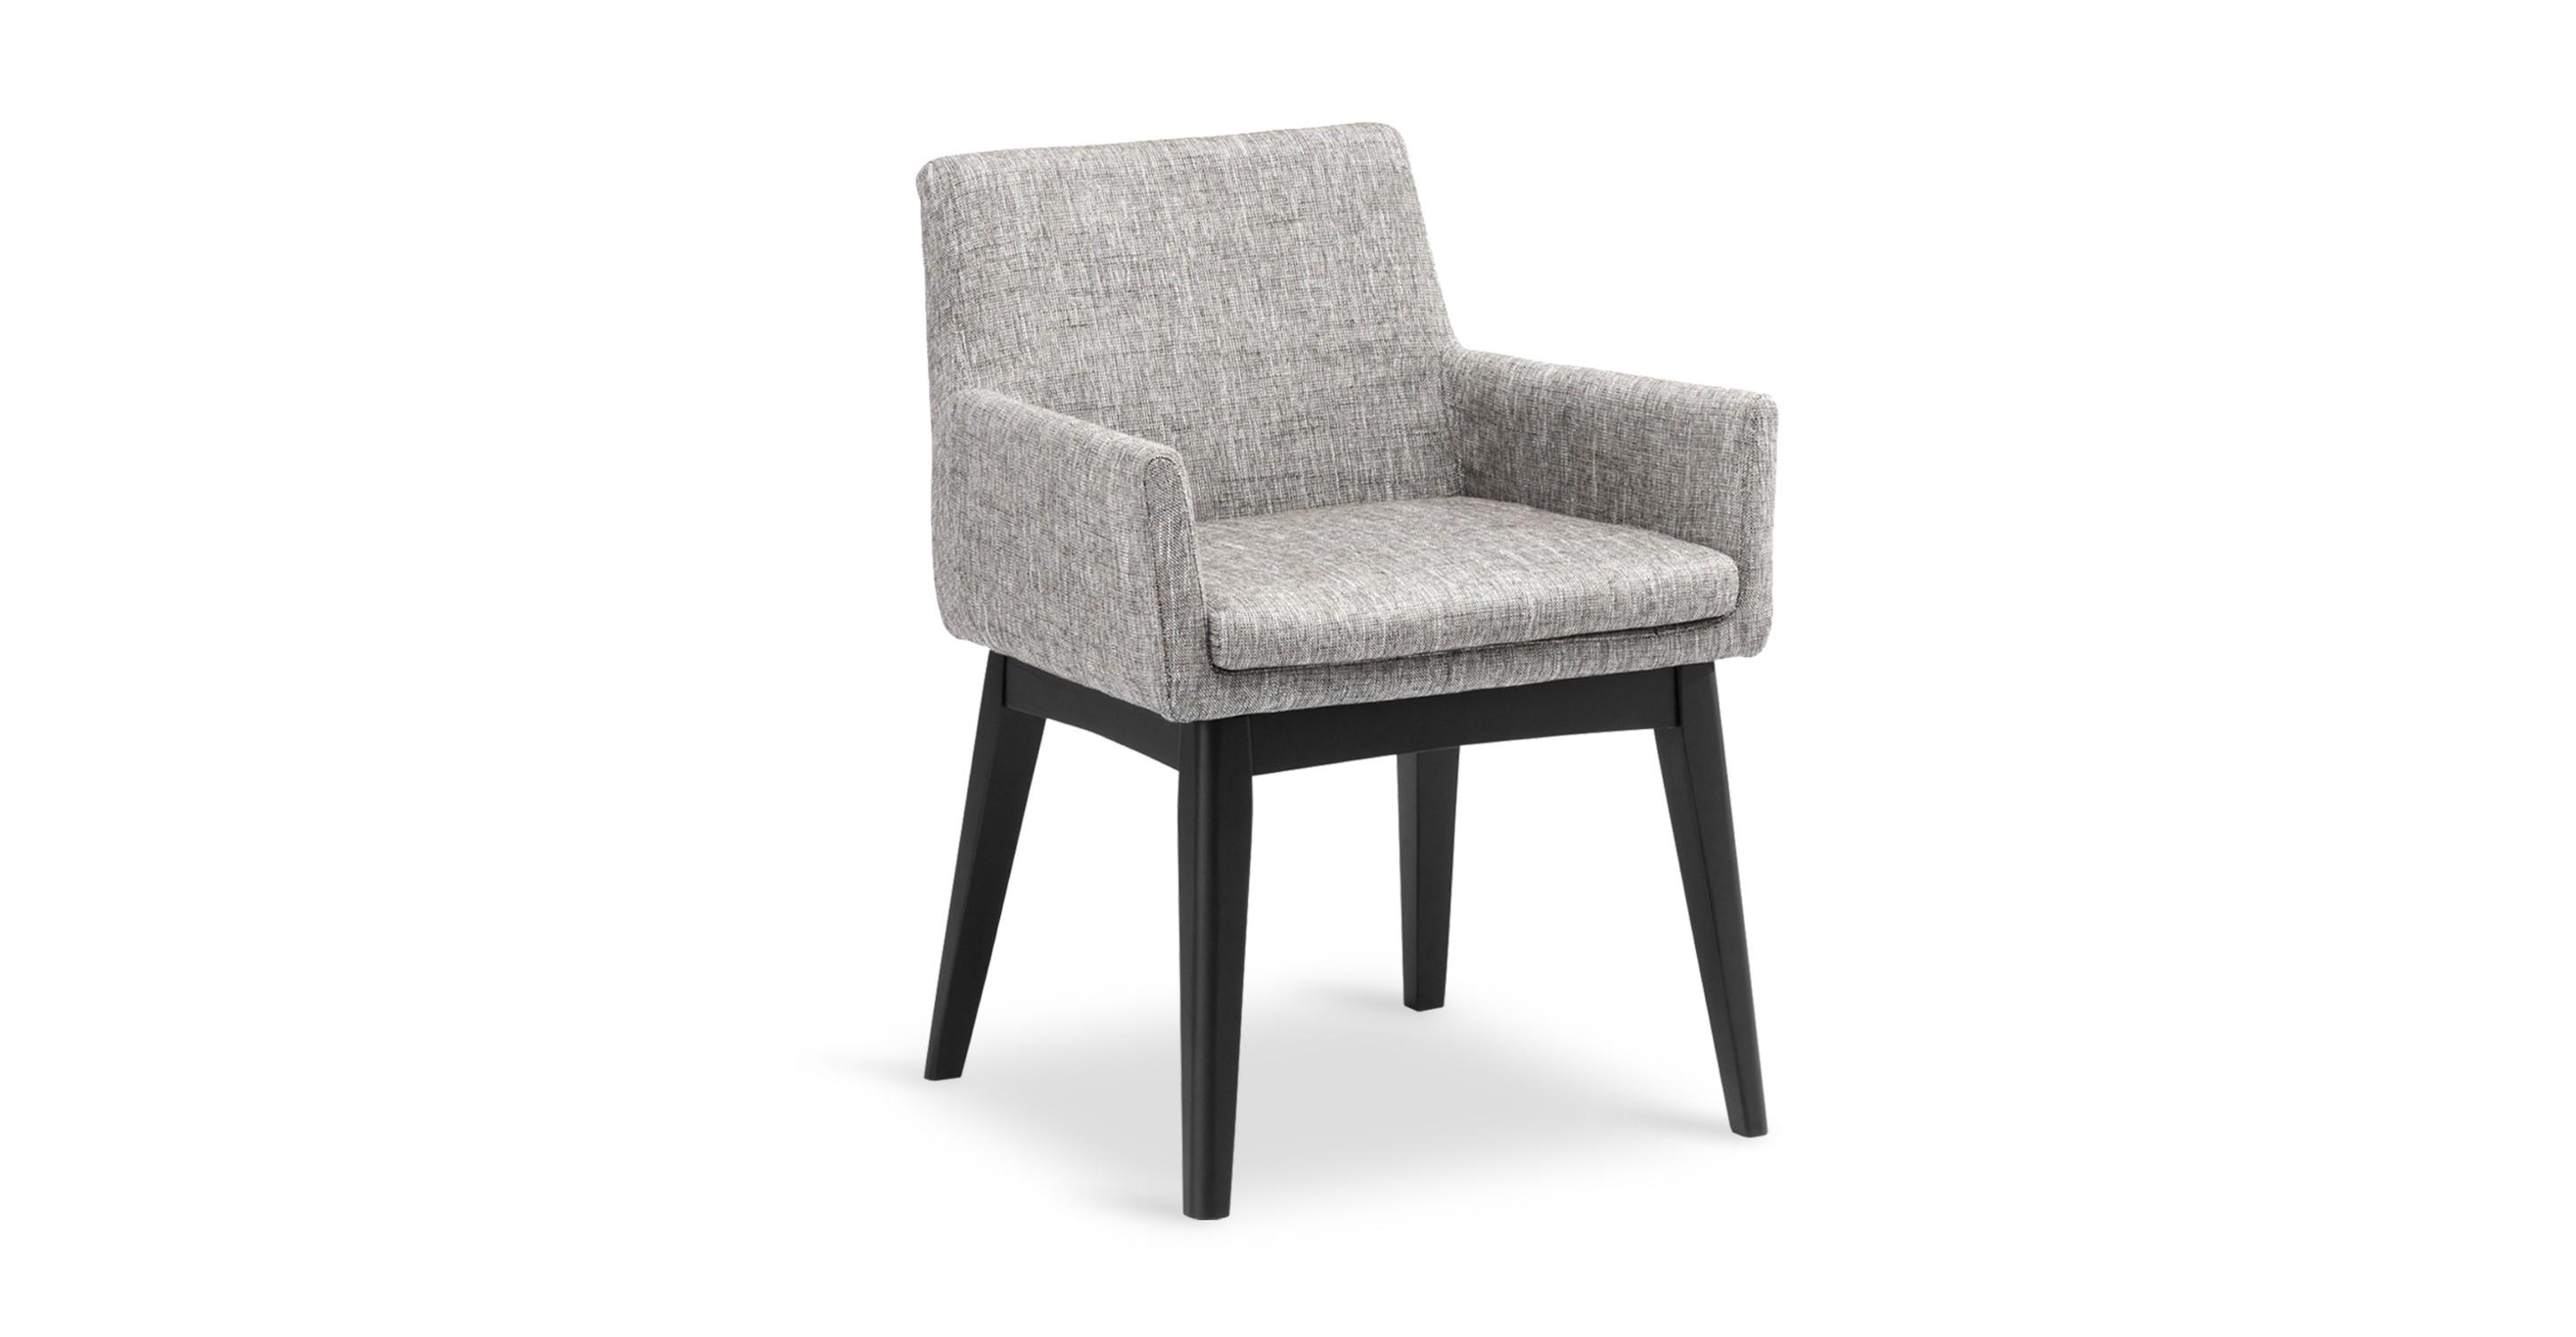 Beige modern armchair - Chanel Coral Ebony Dining Armchair Dining Chairs Article Modern Mid Century And Scandinavian Furniture